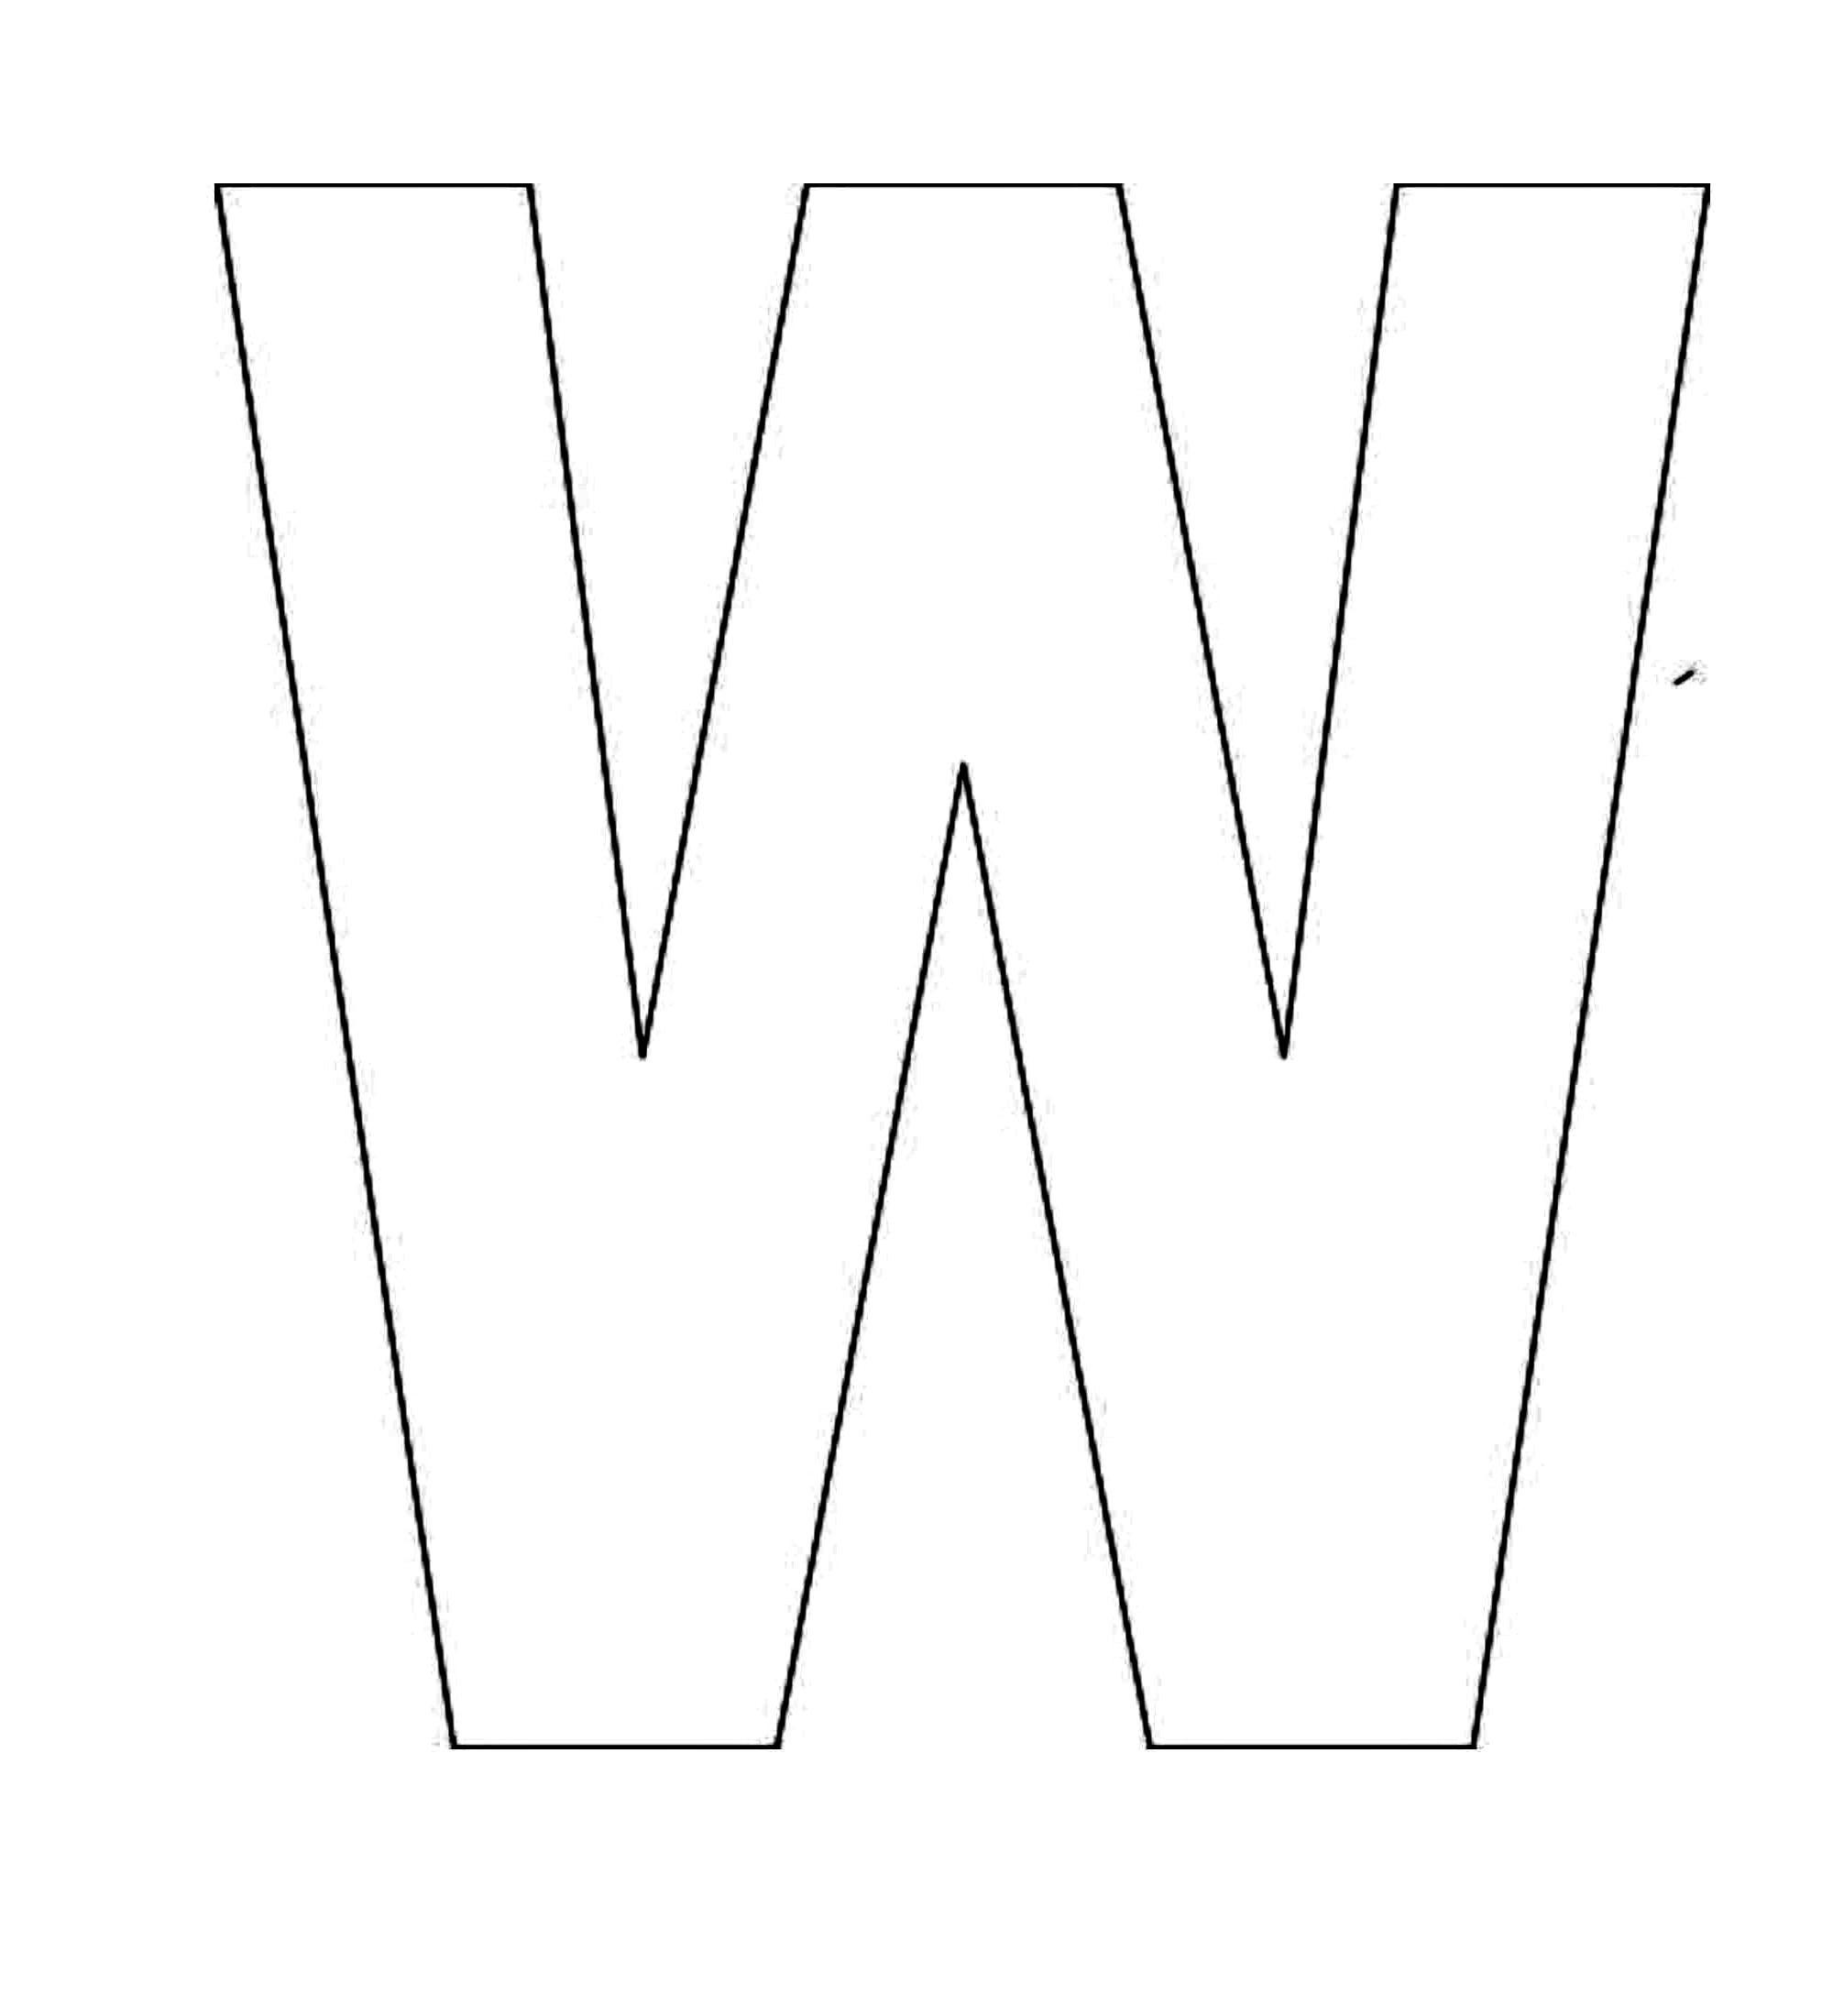 large letter w template  Alphabet-Letter-W-Template-For-Kids.jpg 2,000×2,200 pixels ..